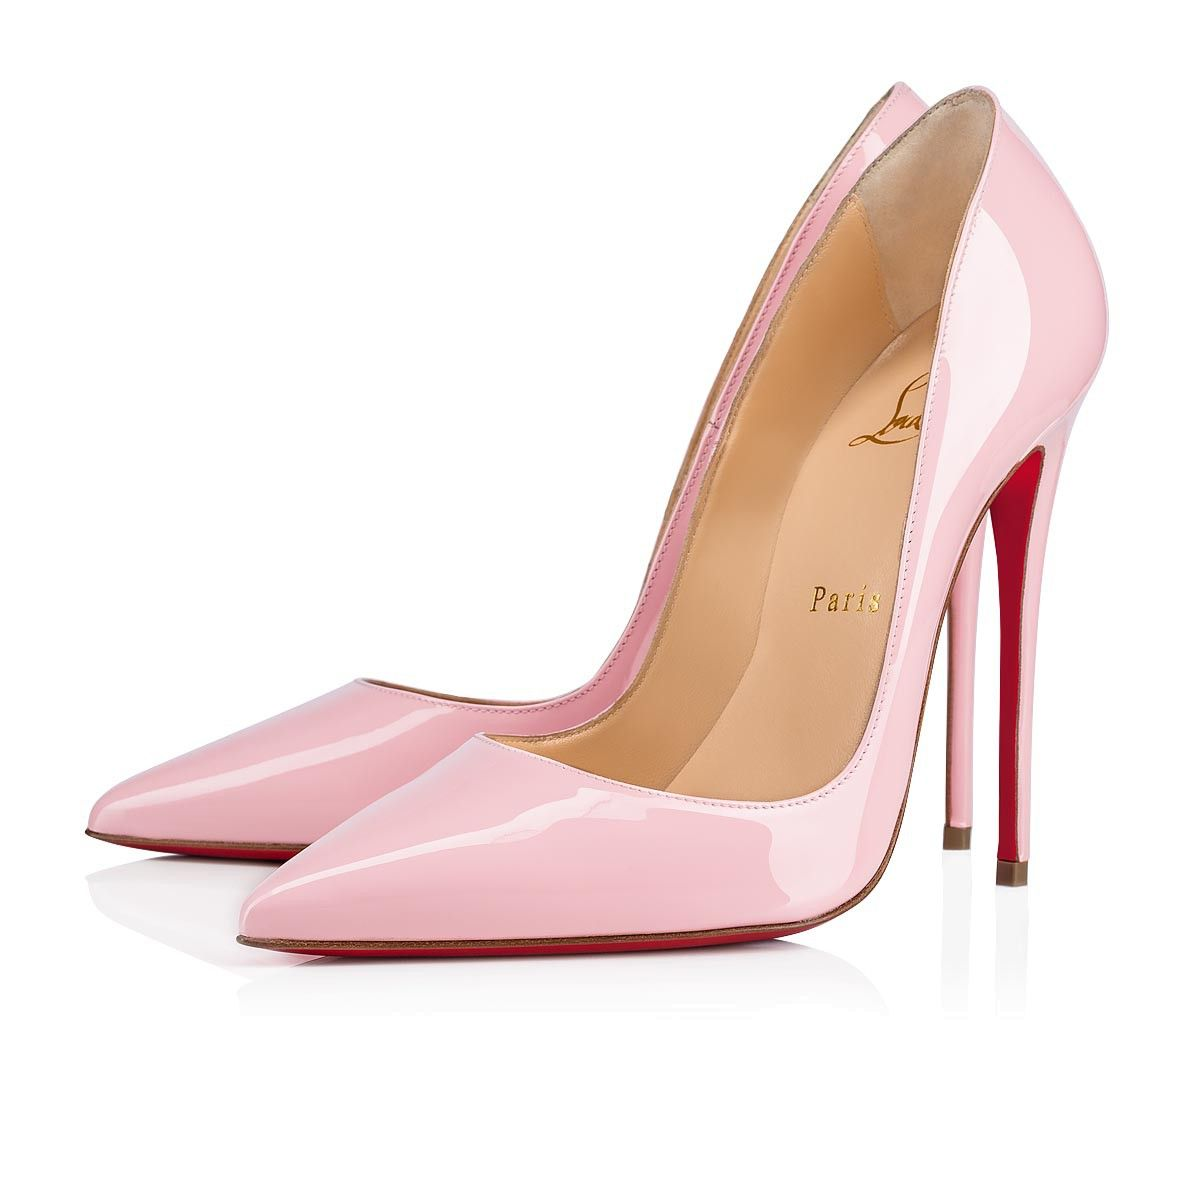 02368e47501 So Kate 120 Eglantine Patent Leather - Women Shoes - Christian ...